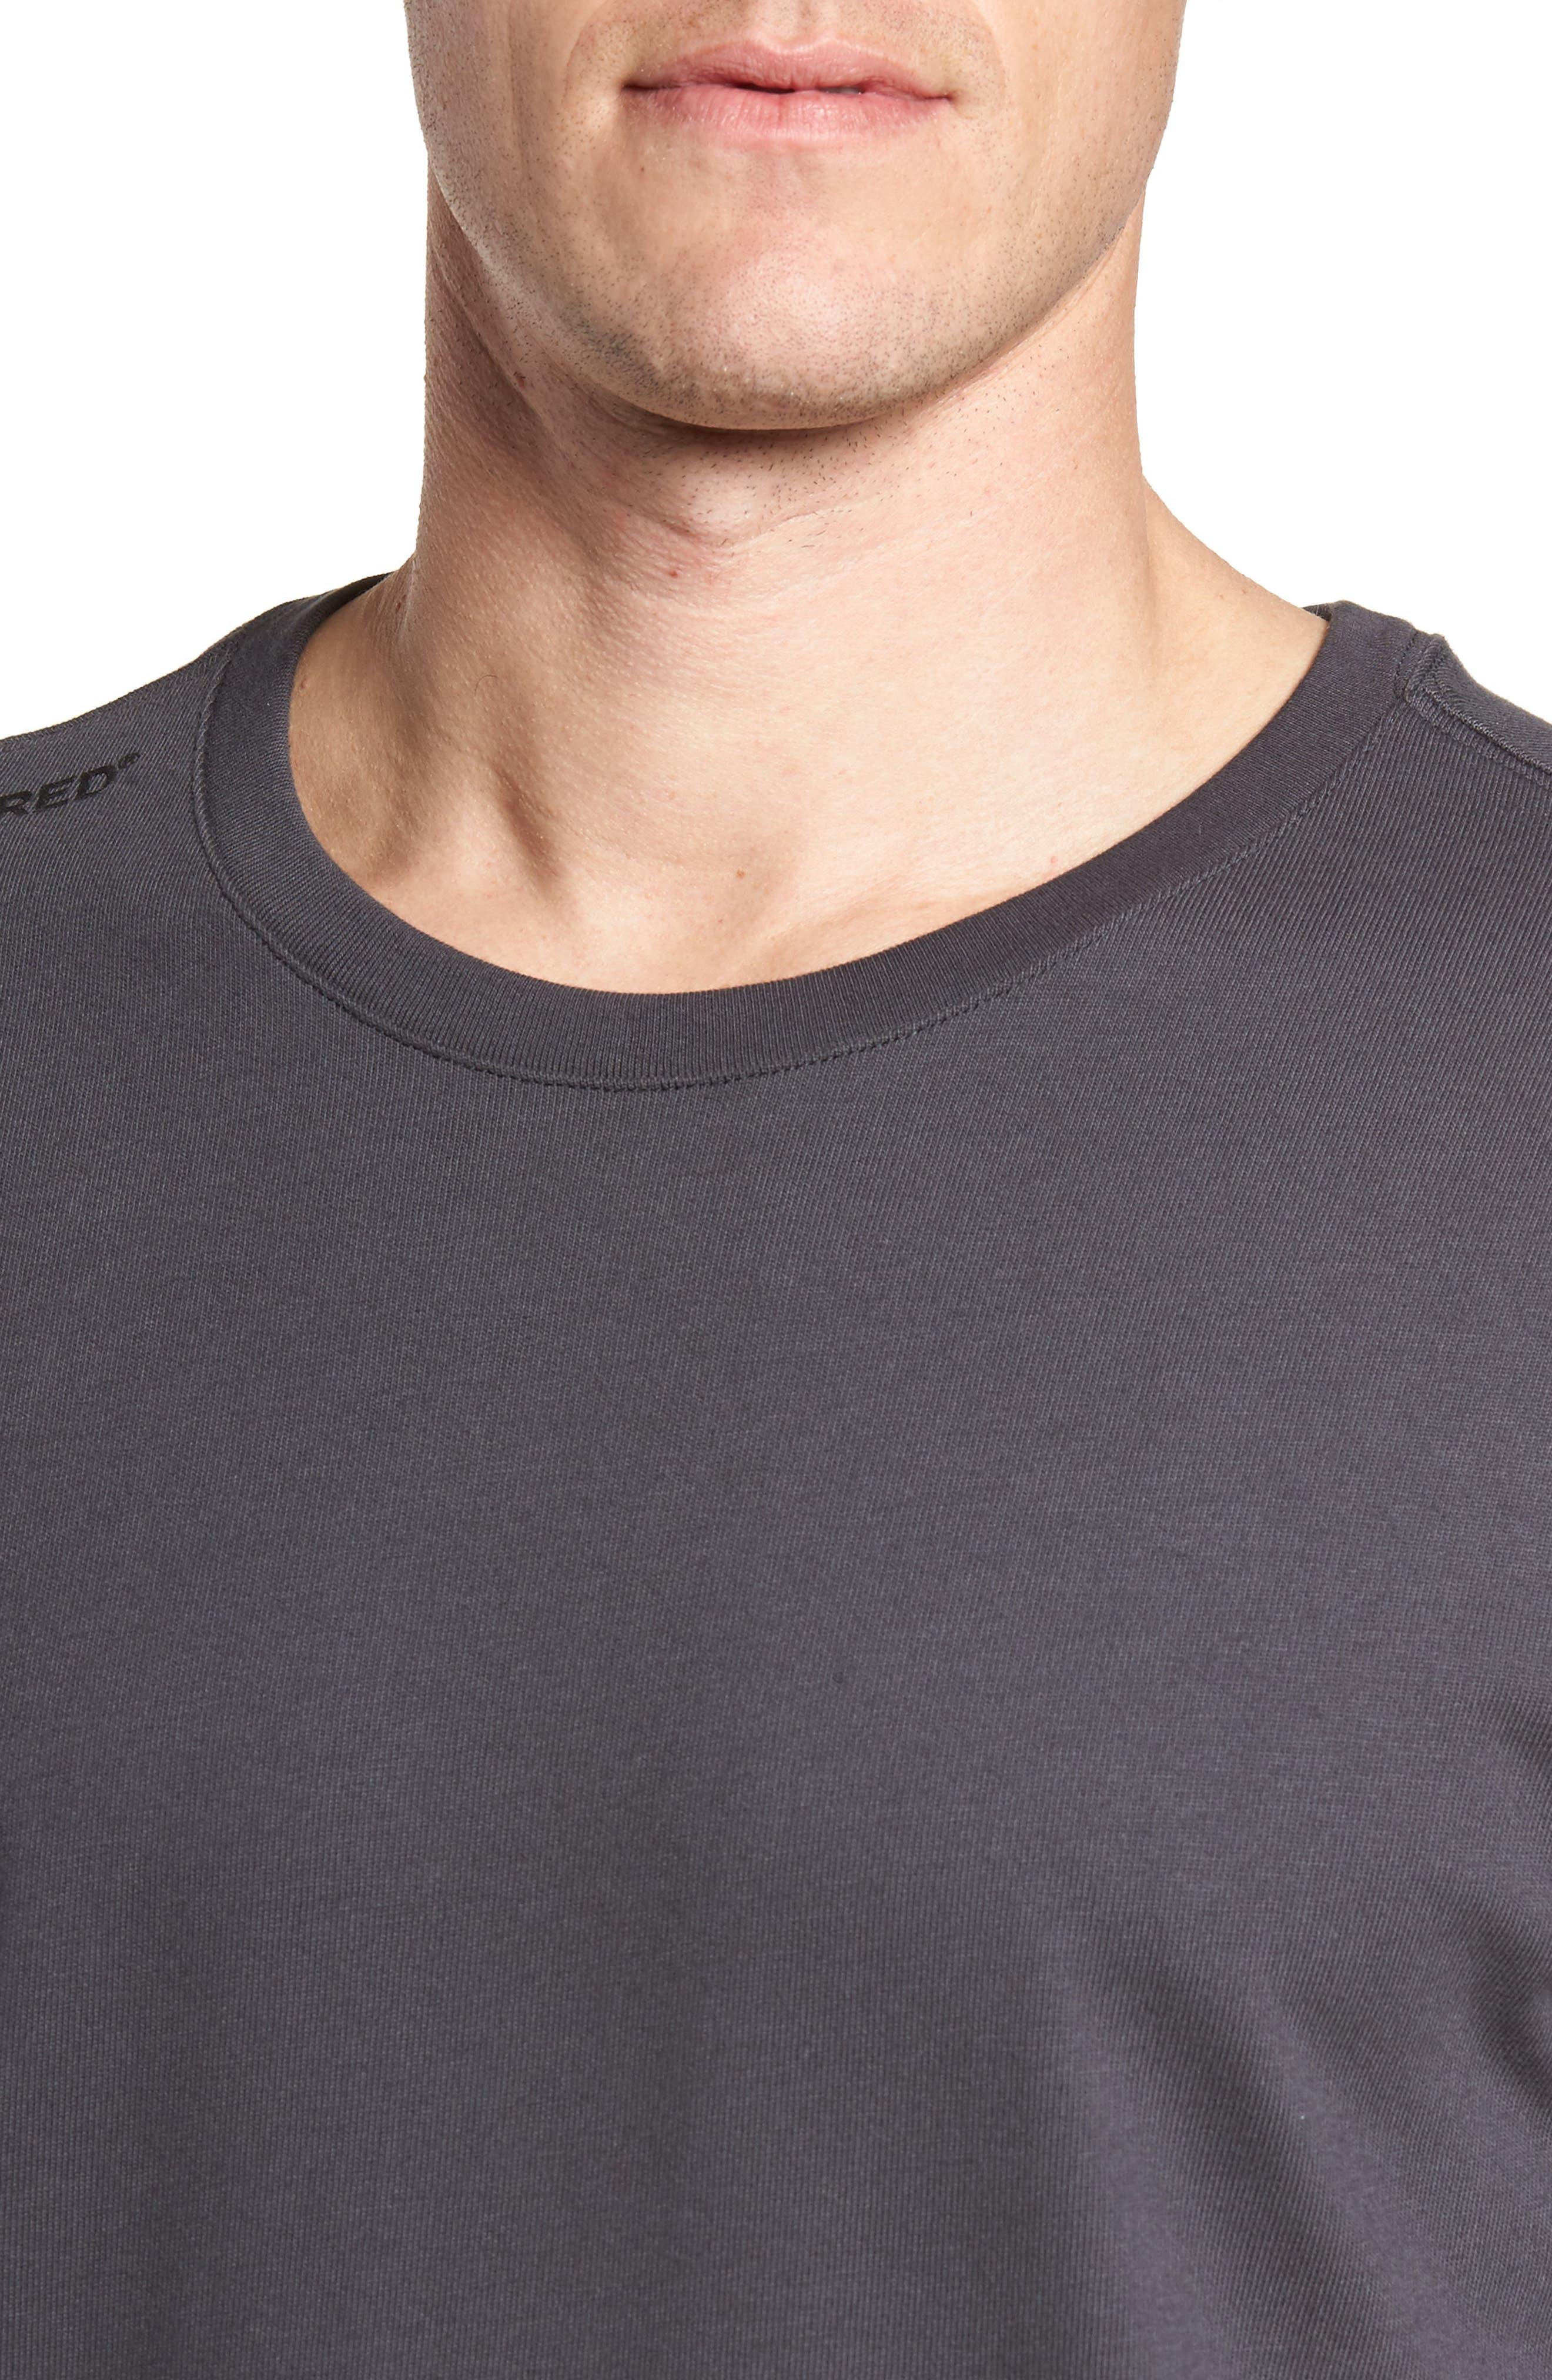 Sportswear 23 Engineered T-Shirt,                             Alternate thumbnail 4, color,                             Anthracite/ Black